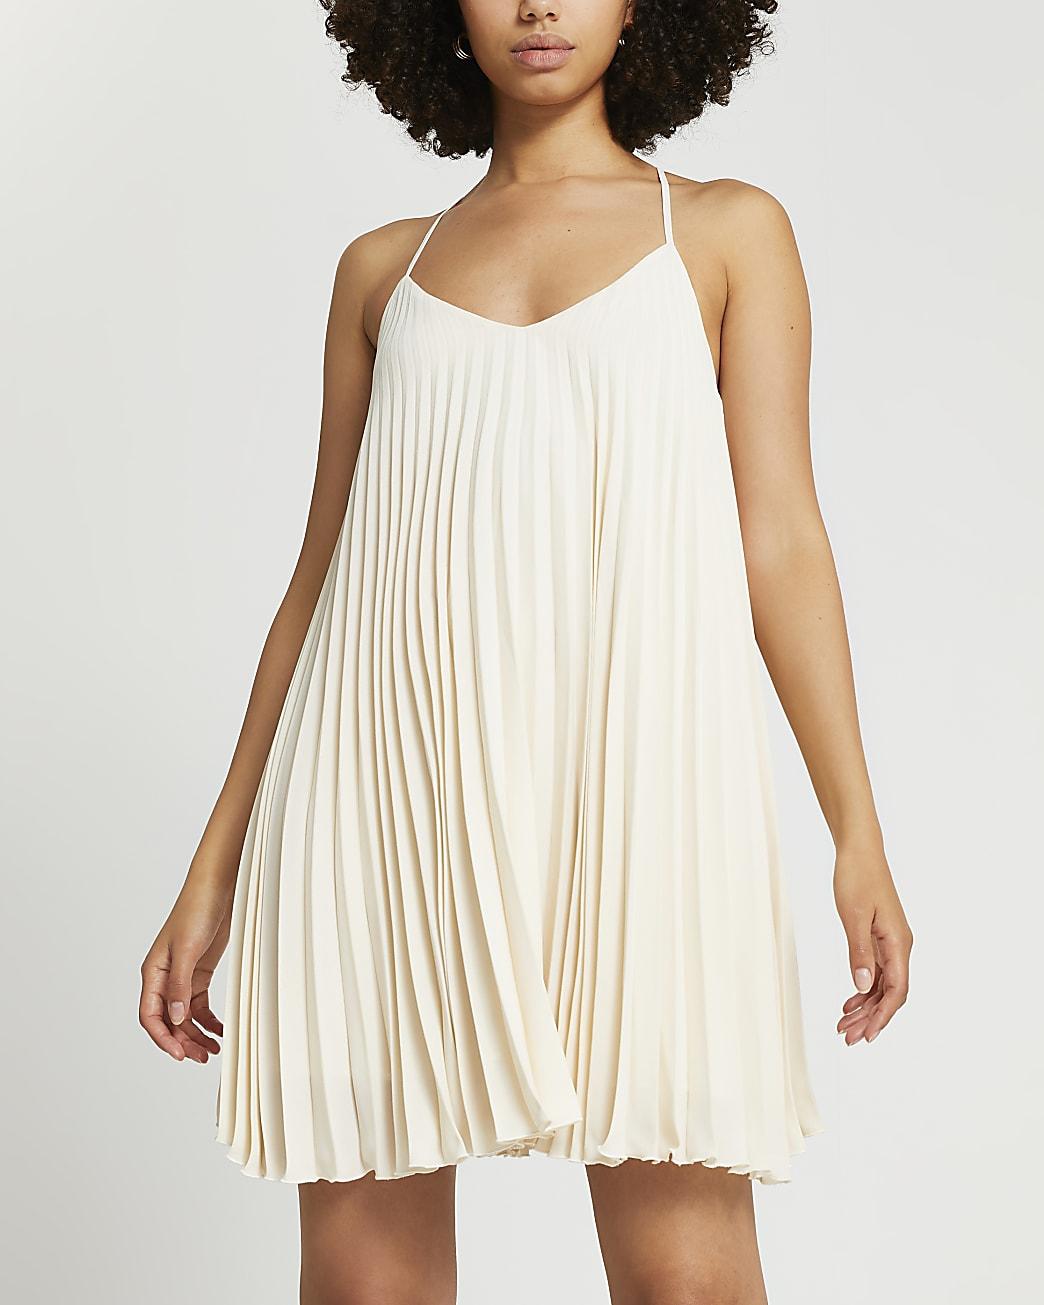 Beige pleated slip dress